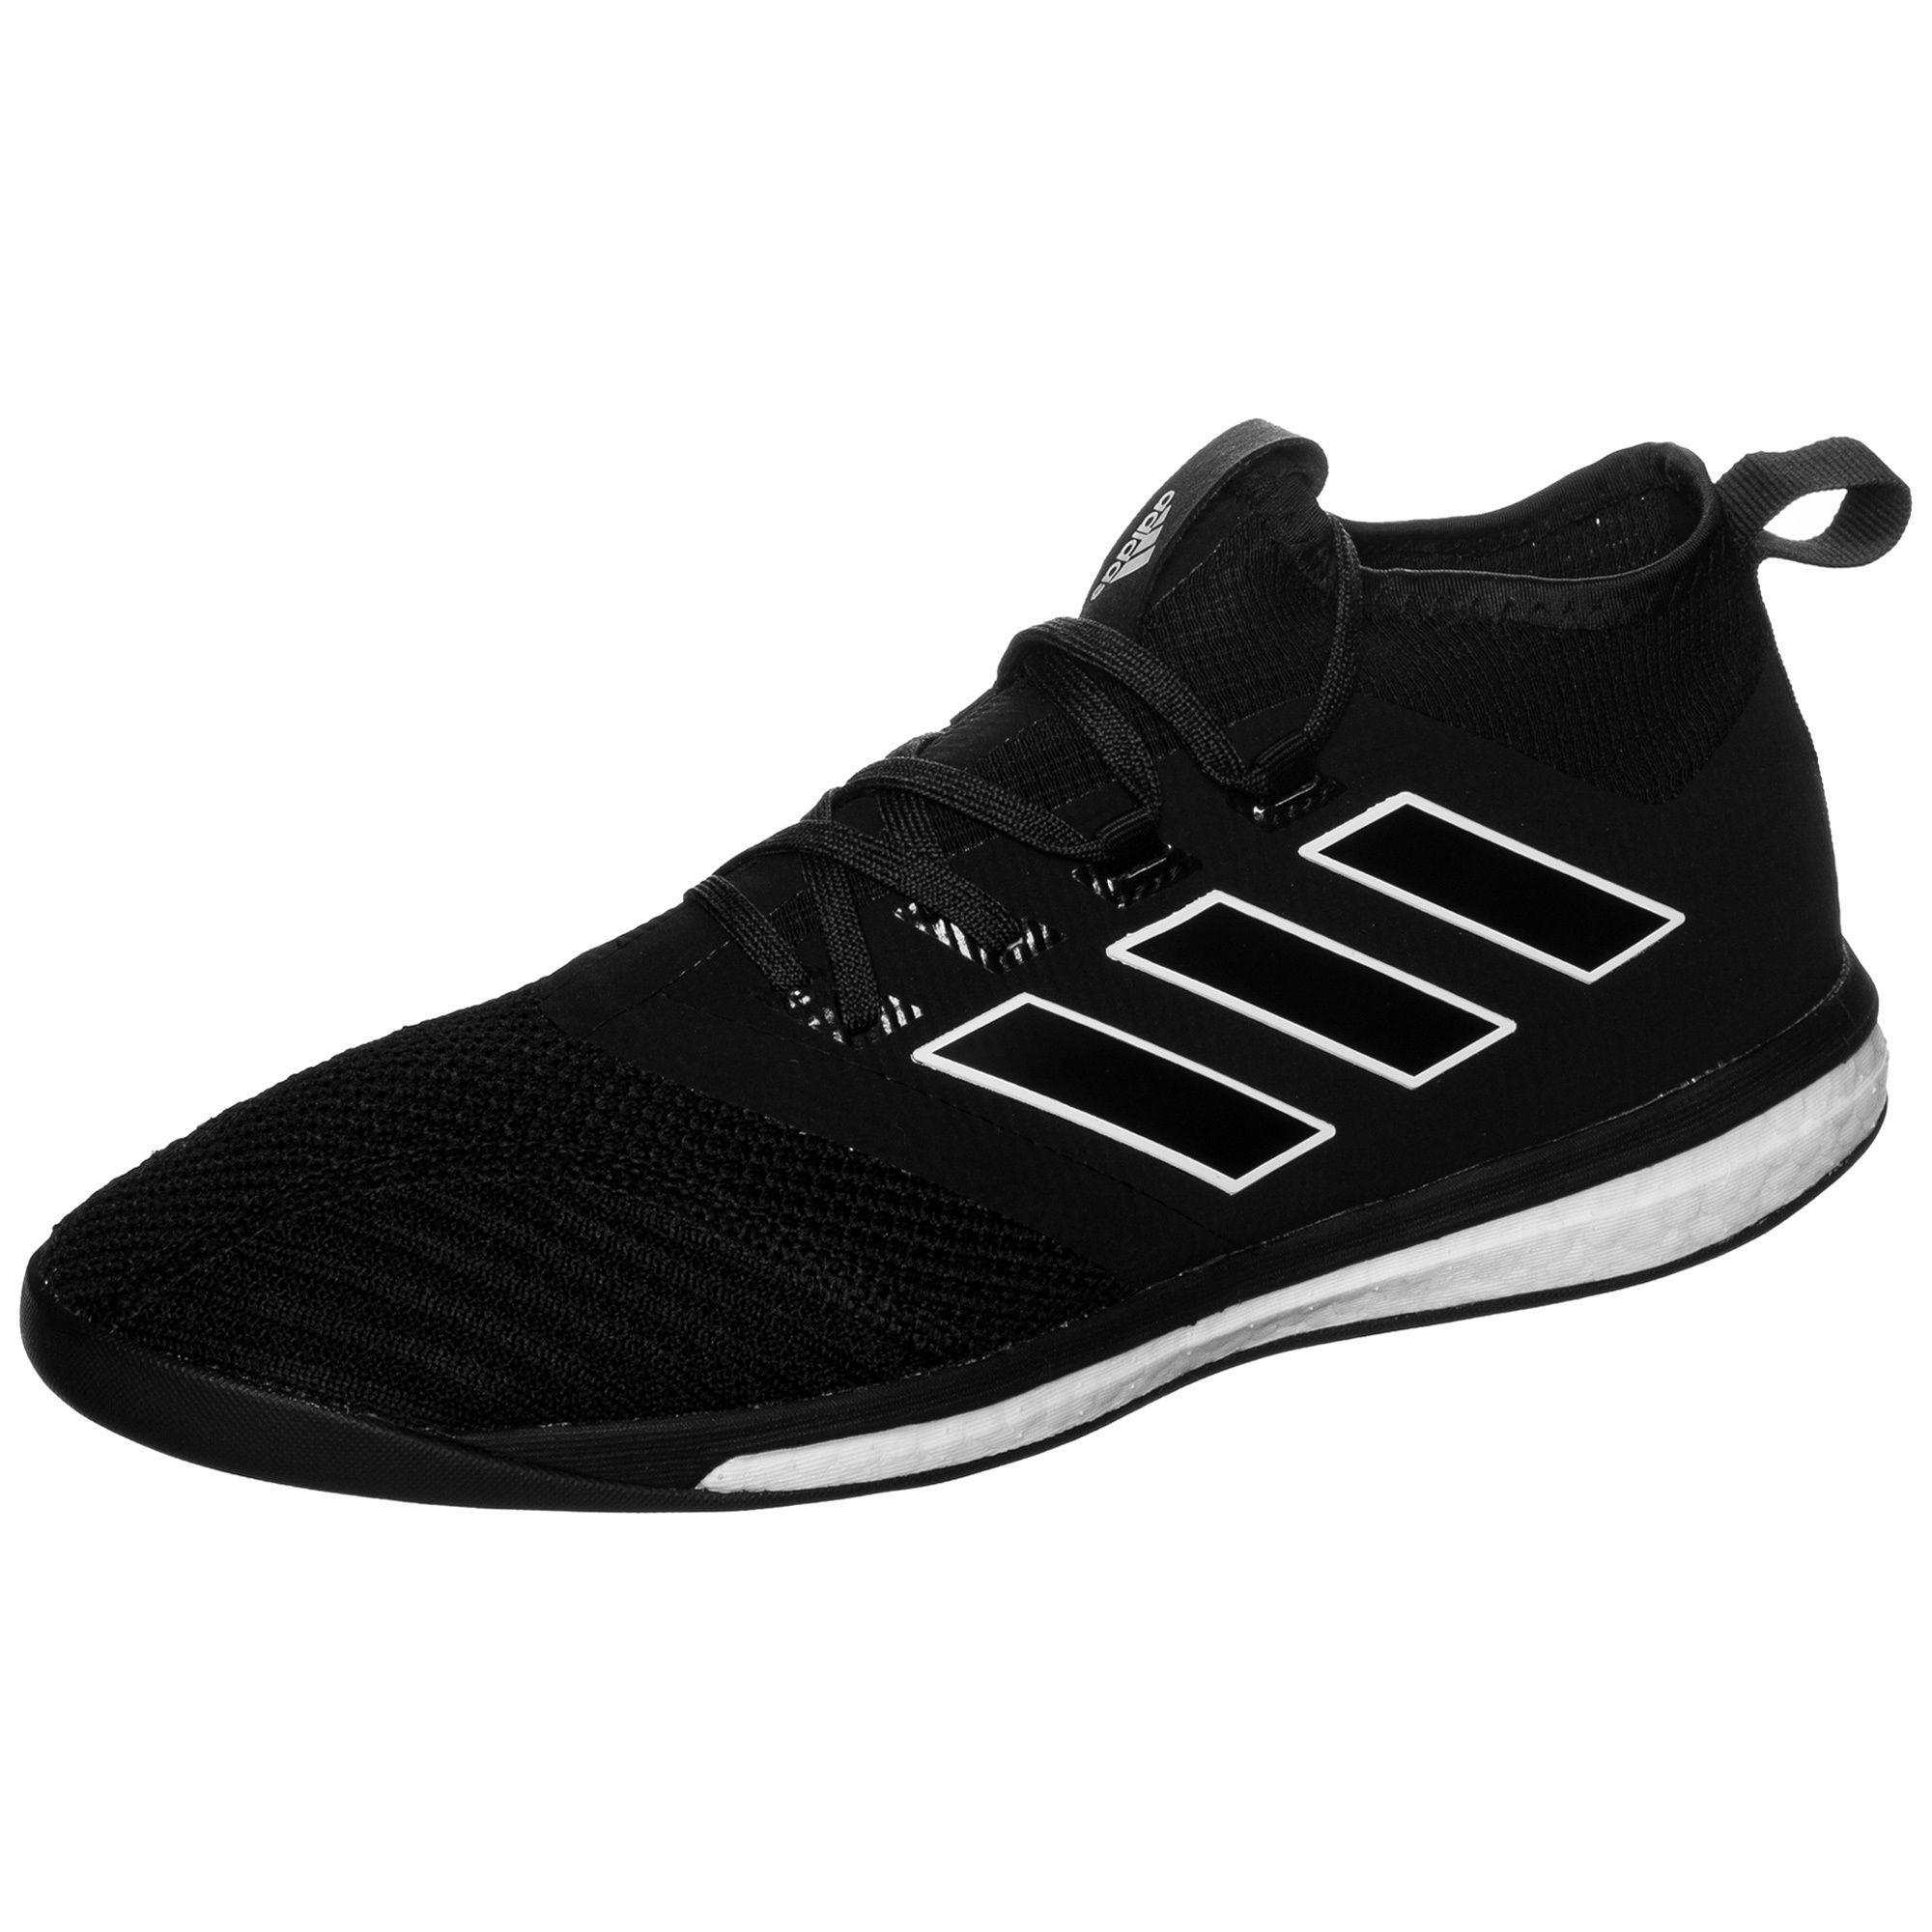 ADIDAS PERFORMANCE adidas Performance ACE Tango 17.1 Trainers Street Fußballschuh Herren